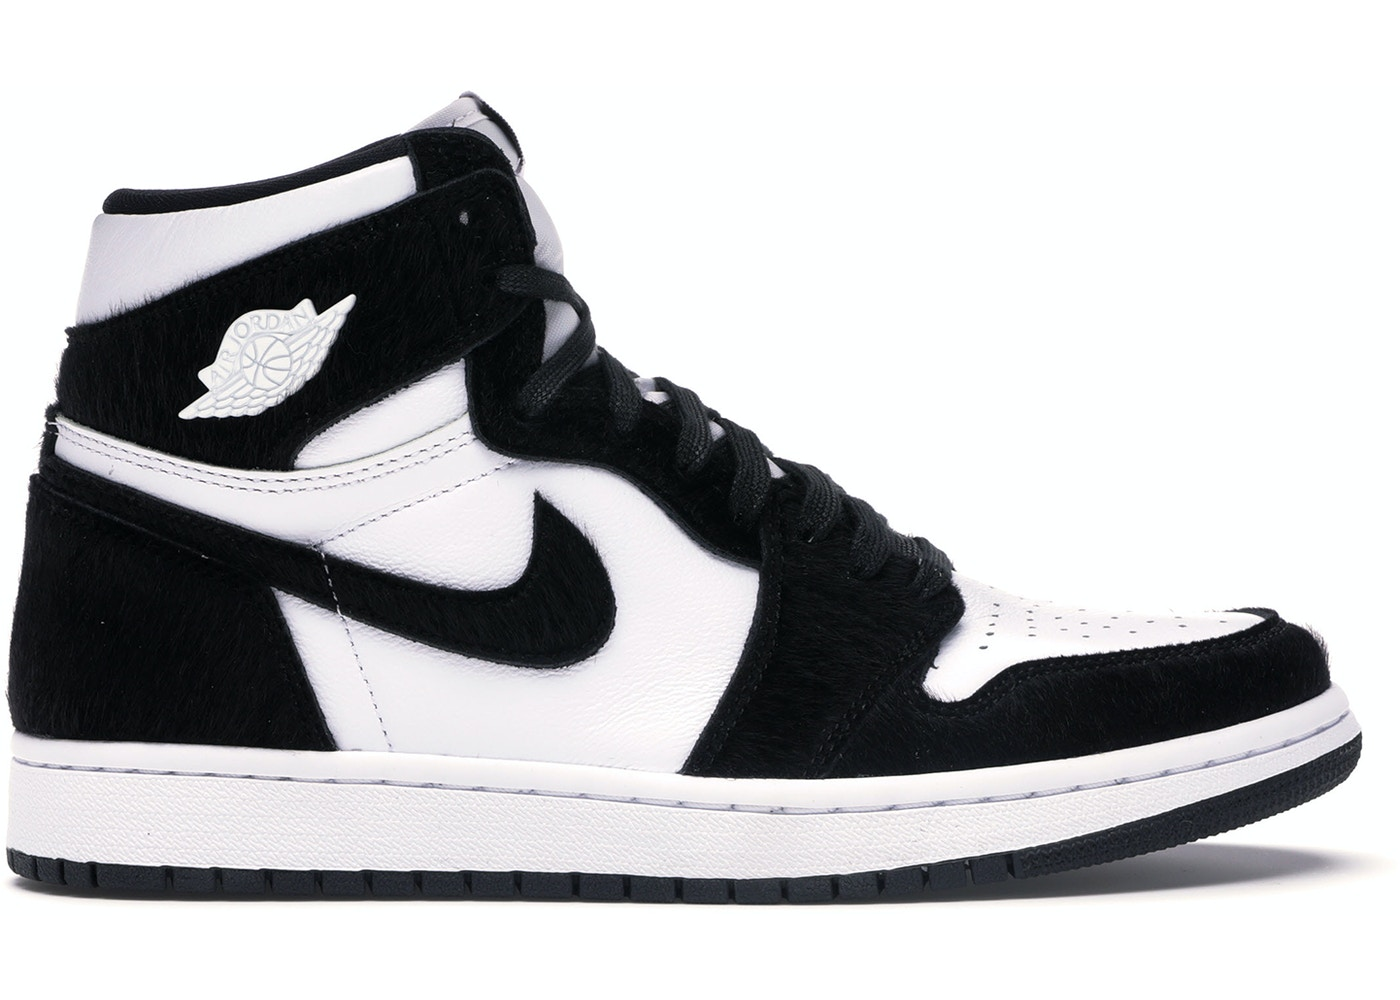 87d0e926d8ce Buy Air Jordan 1 Shoes & Deadstock Sneakers